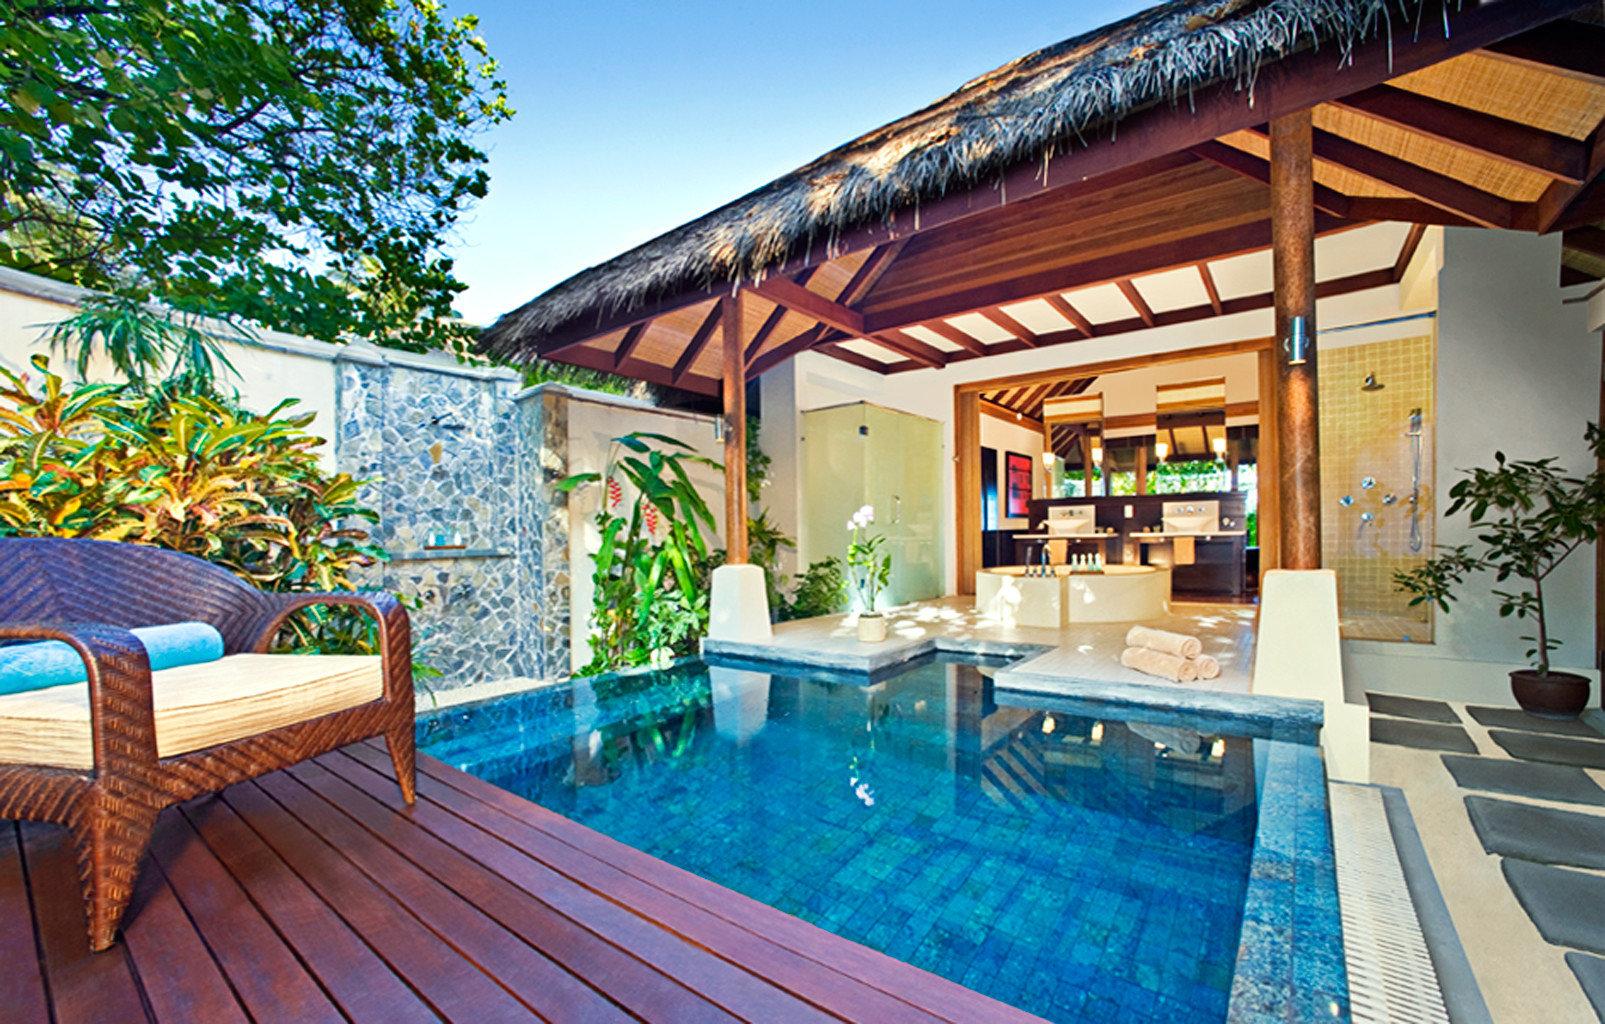 Bath Elegant Hot tub/Jacuzzi Luxury Romantic swimming pool leisure property building Resort Villa backyard home cottage eco hotel Deck